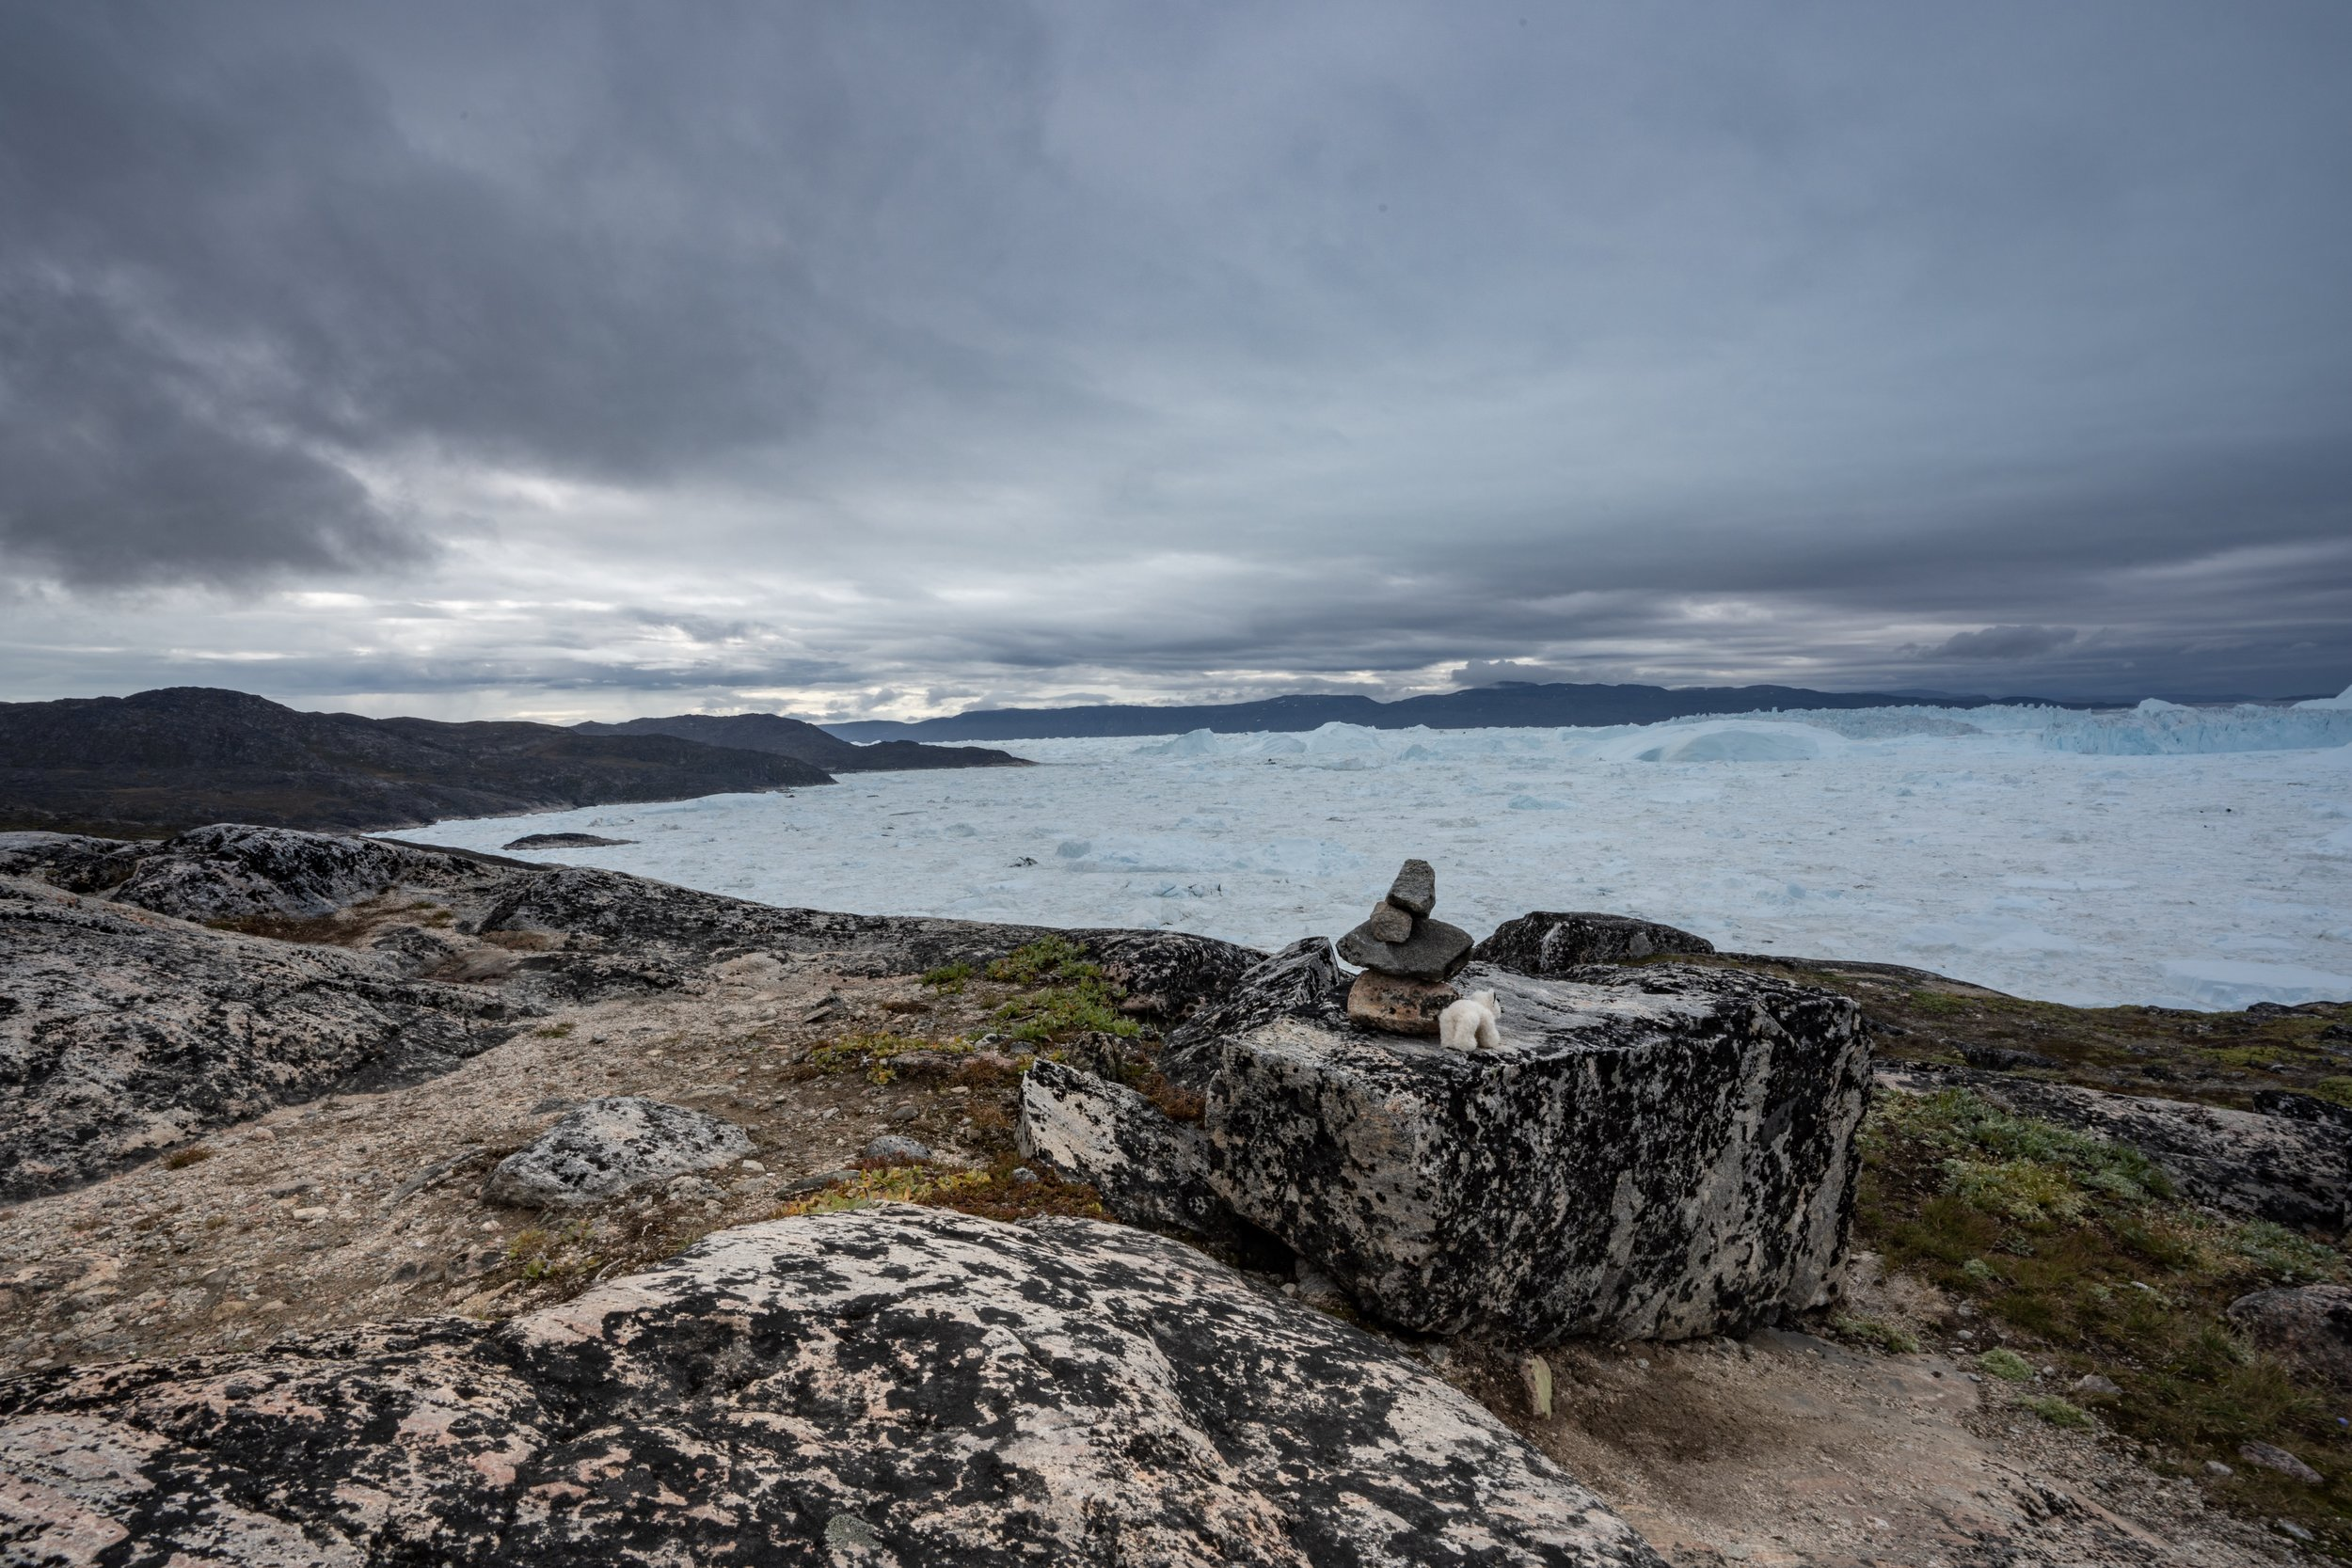 69°16'N | 51°17'W ● Ilulissat | Greenland